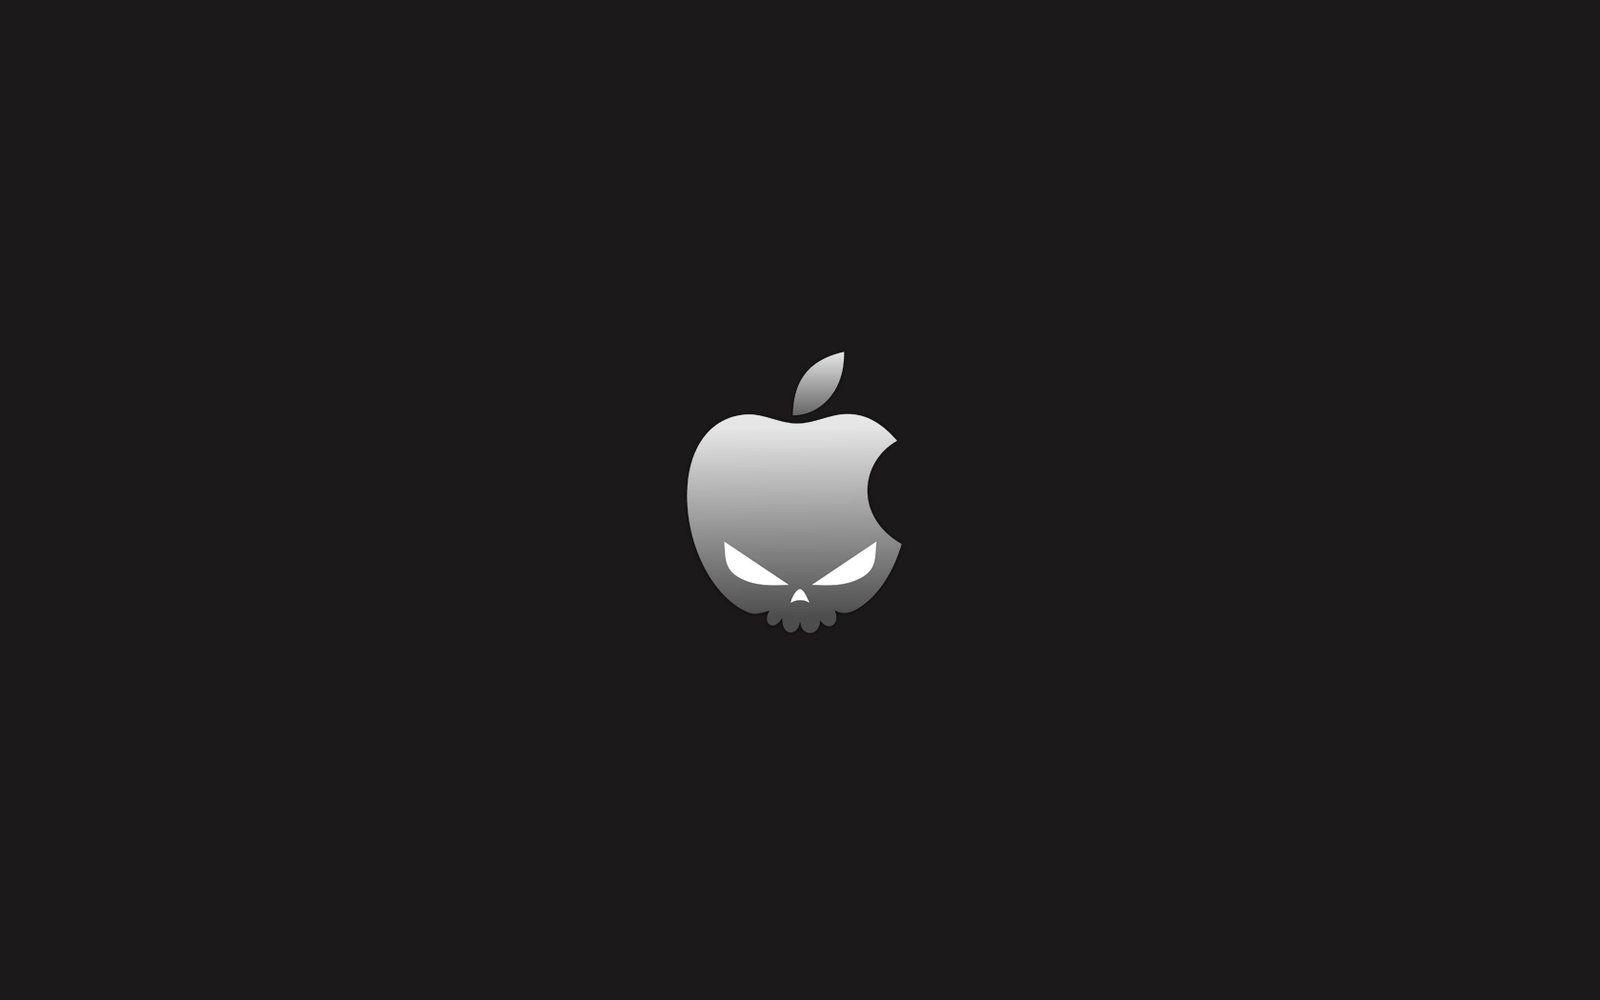 Bad Apple Wallpapers 1600x1000